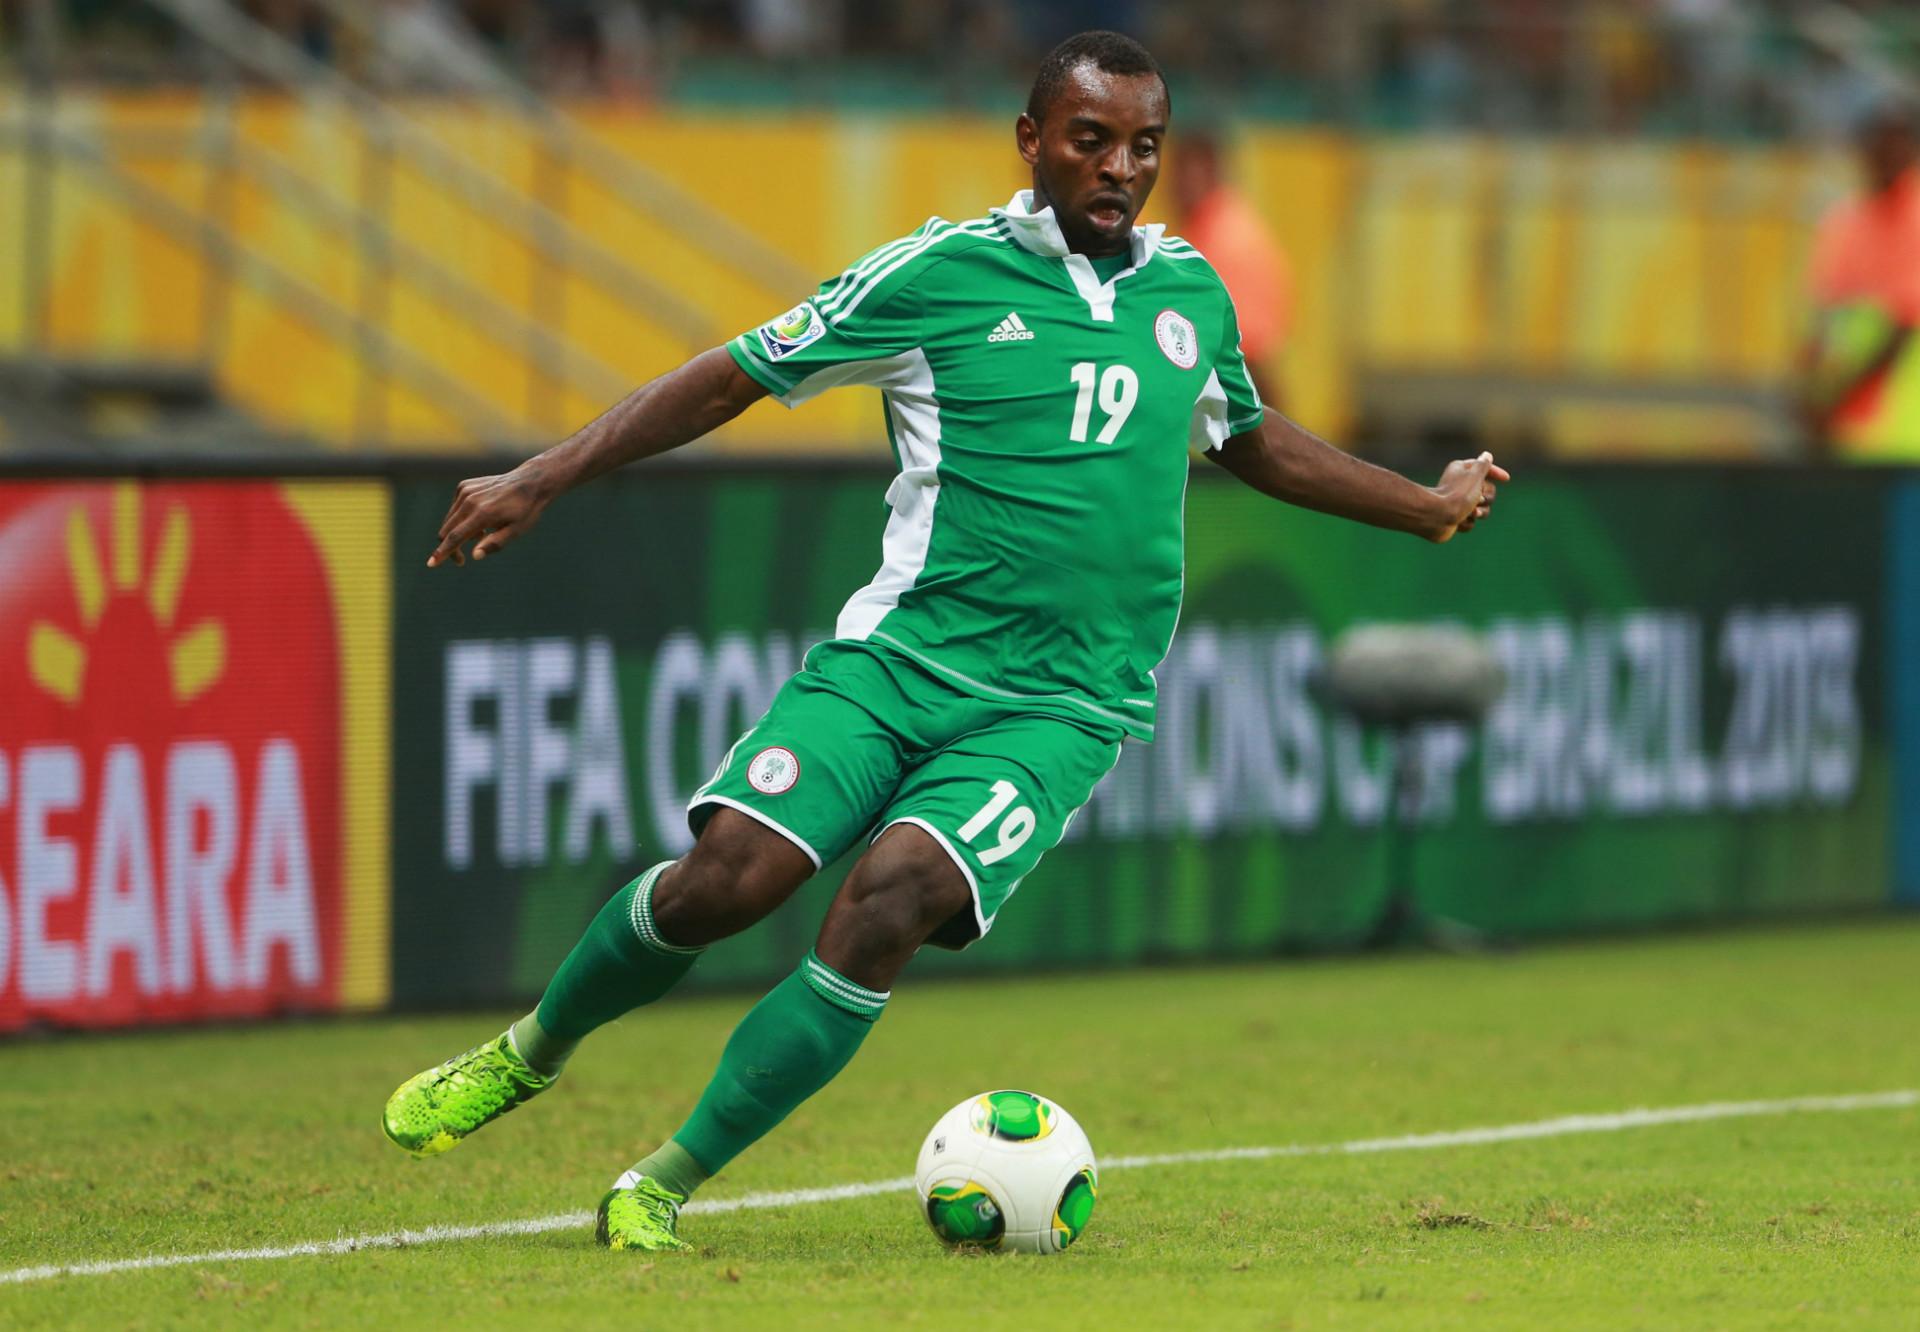 Sunday Mba Nigeria Uruguay Confederations Cup 20062013